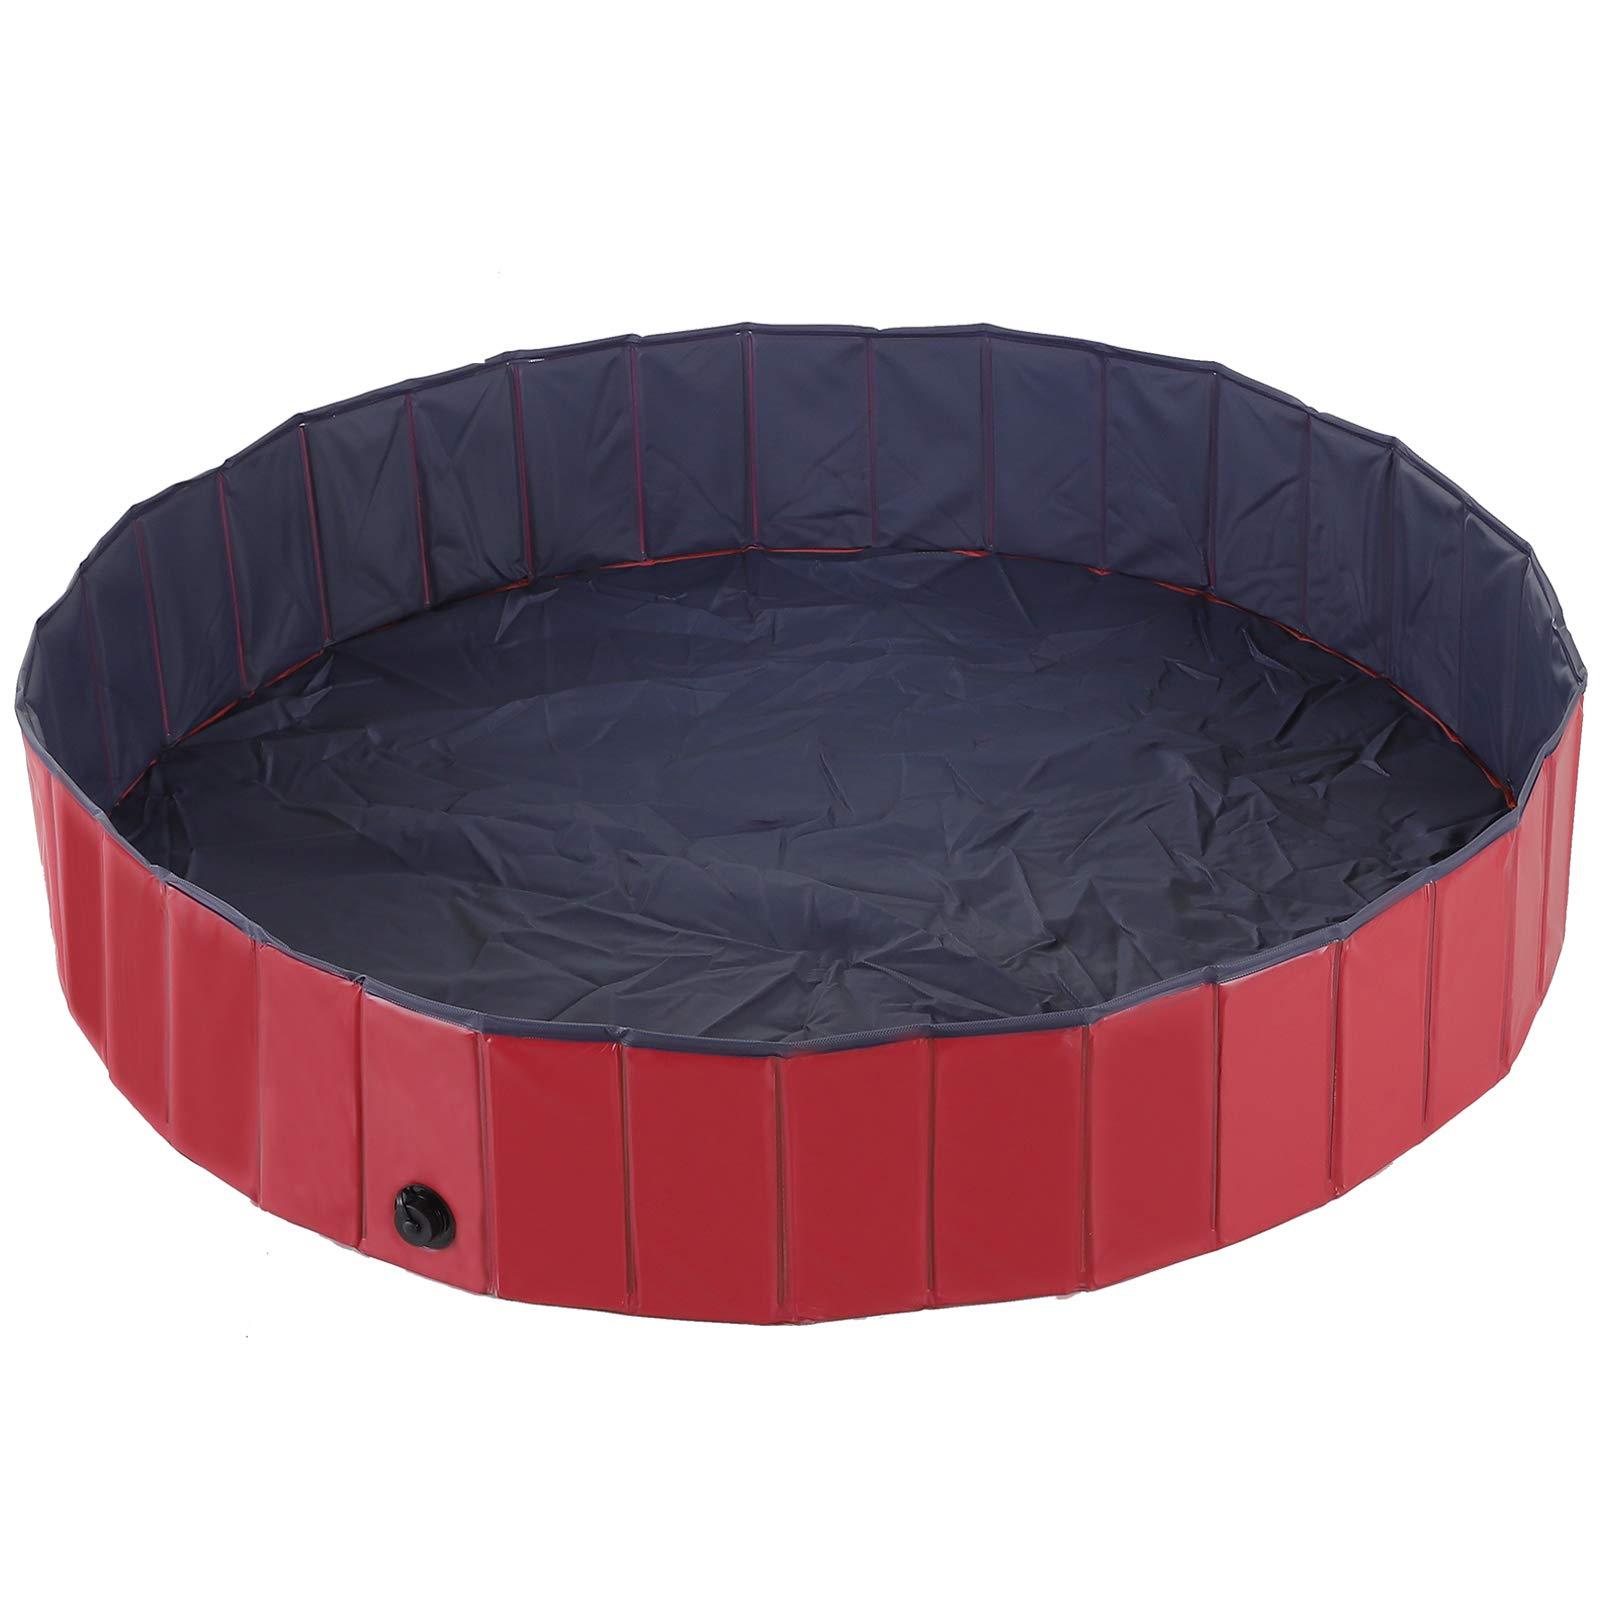 PawHut Pet Swimming Pool Dog Bathing Tub 12'' x 63'' All-Purpose Collapsible PVC Red / Dark Blue